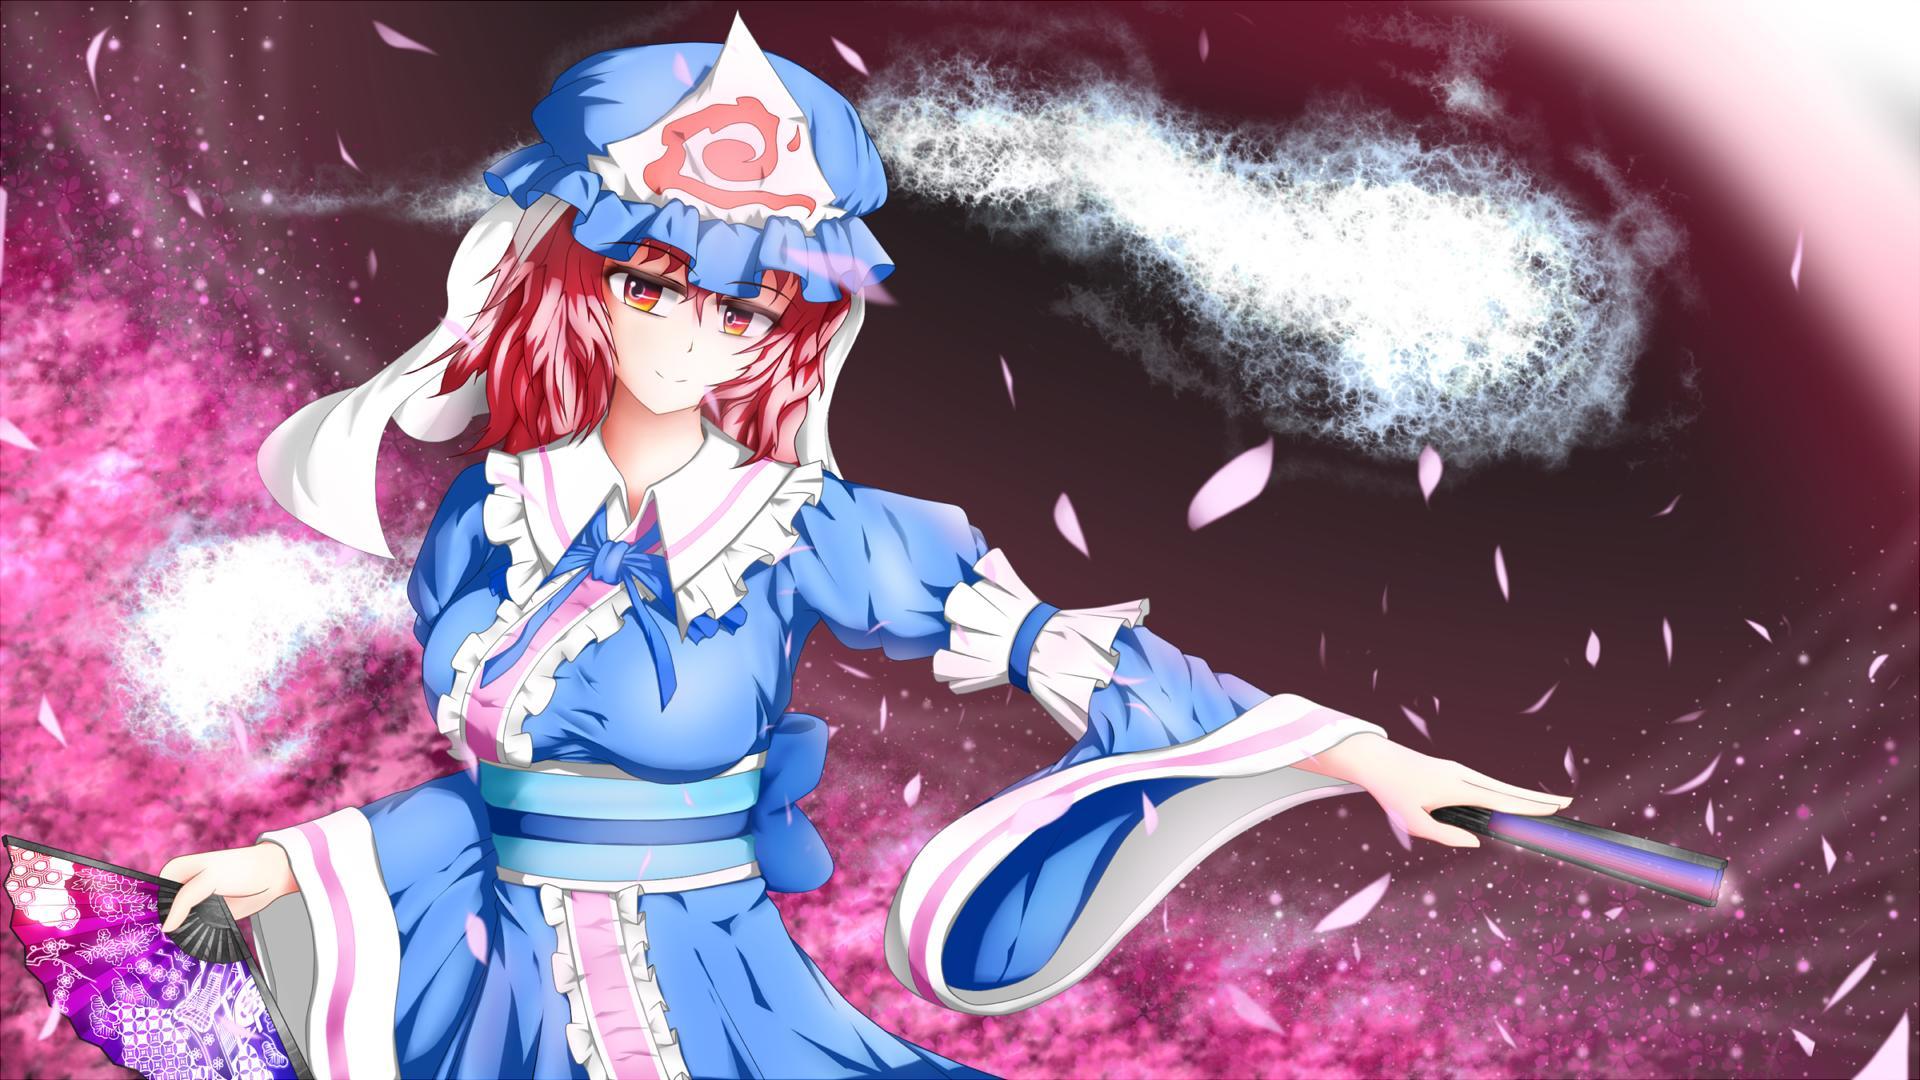 [Gallery] Yuriniel - Sumizome Sakura - Hang Ma MOx3ji0